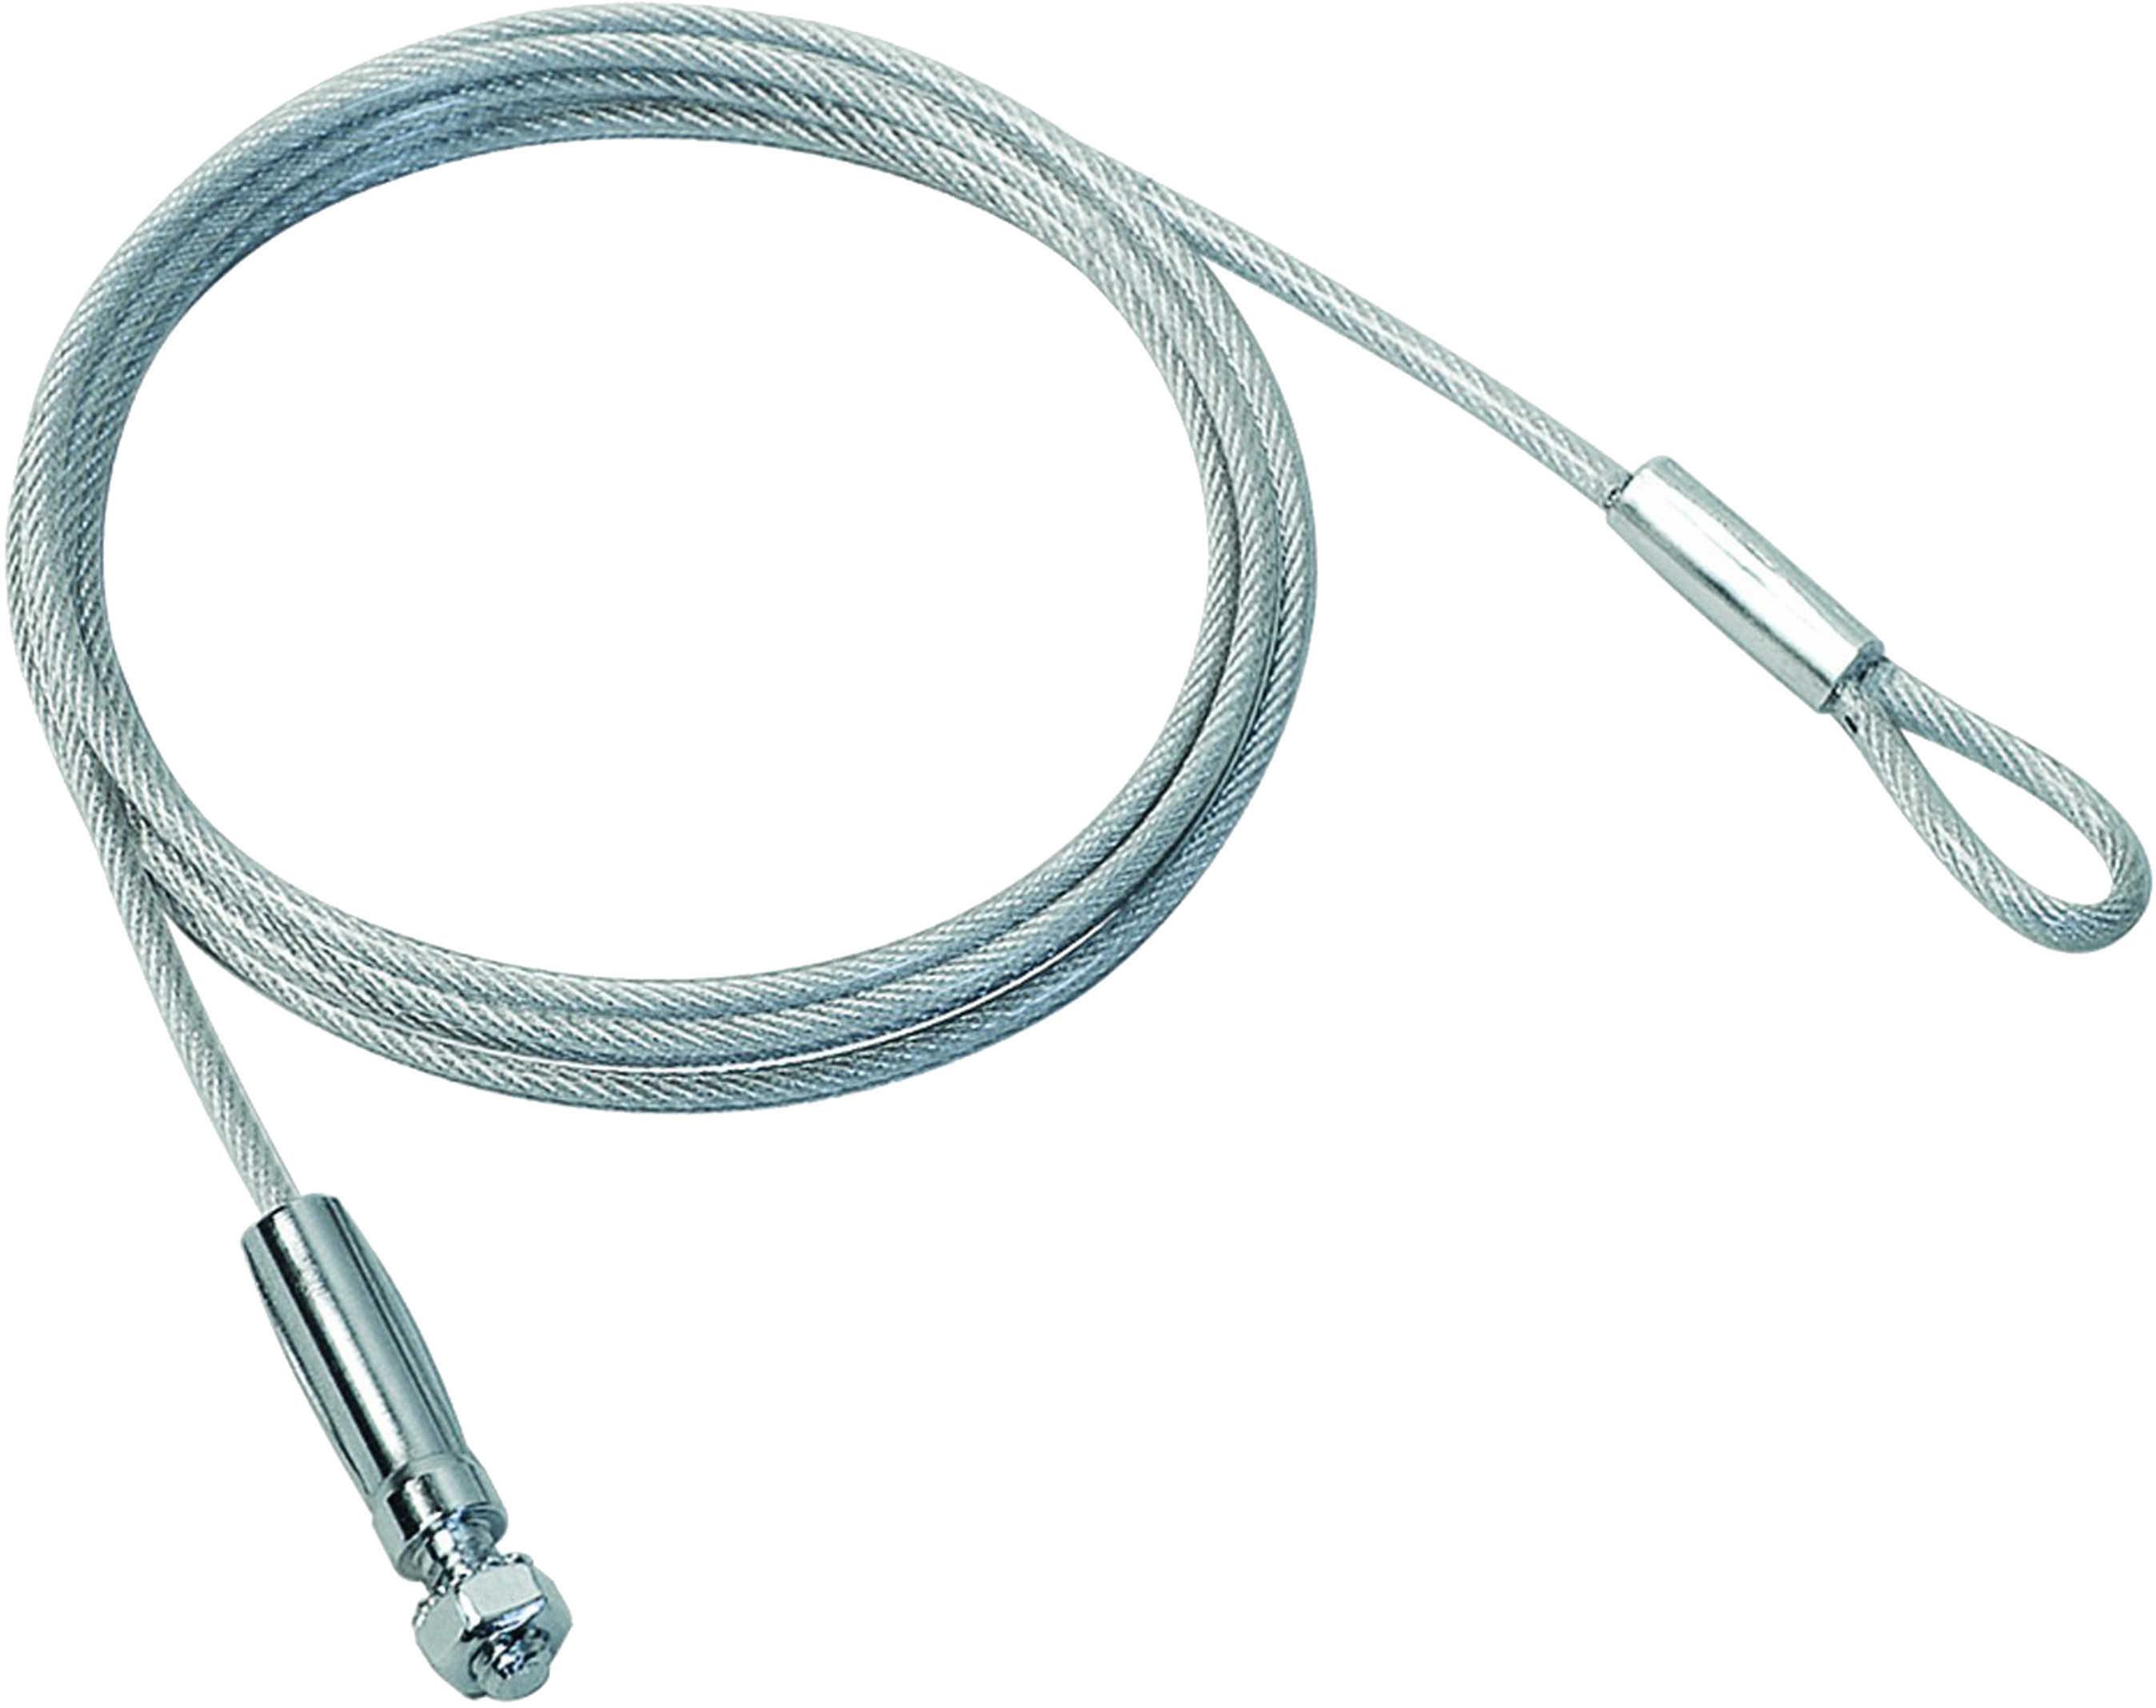 GUNVAULT 6' Security Cable To Secure GUNVAULT Safe